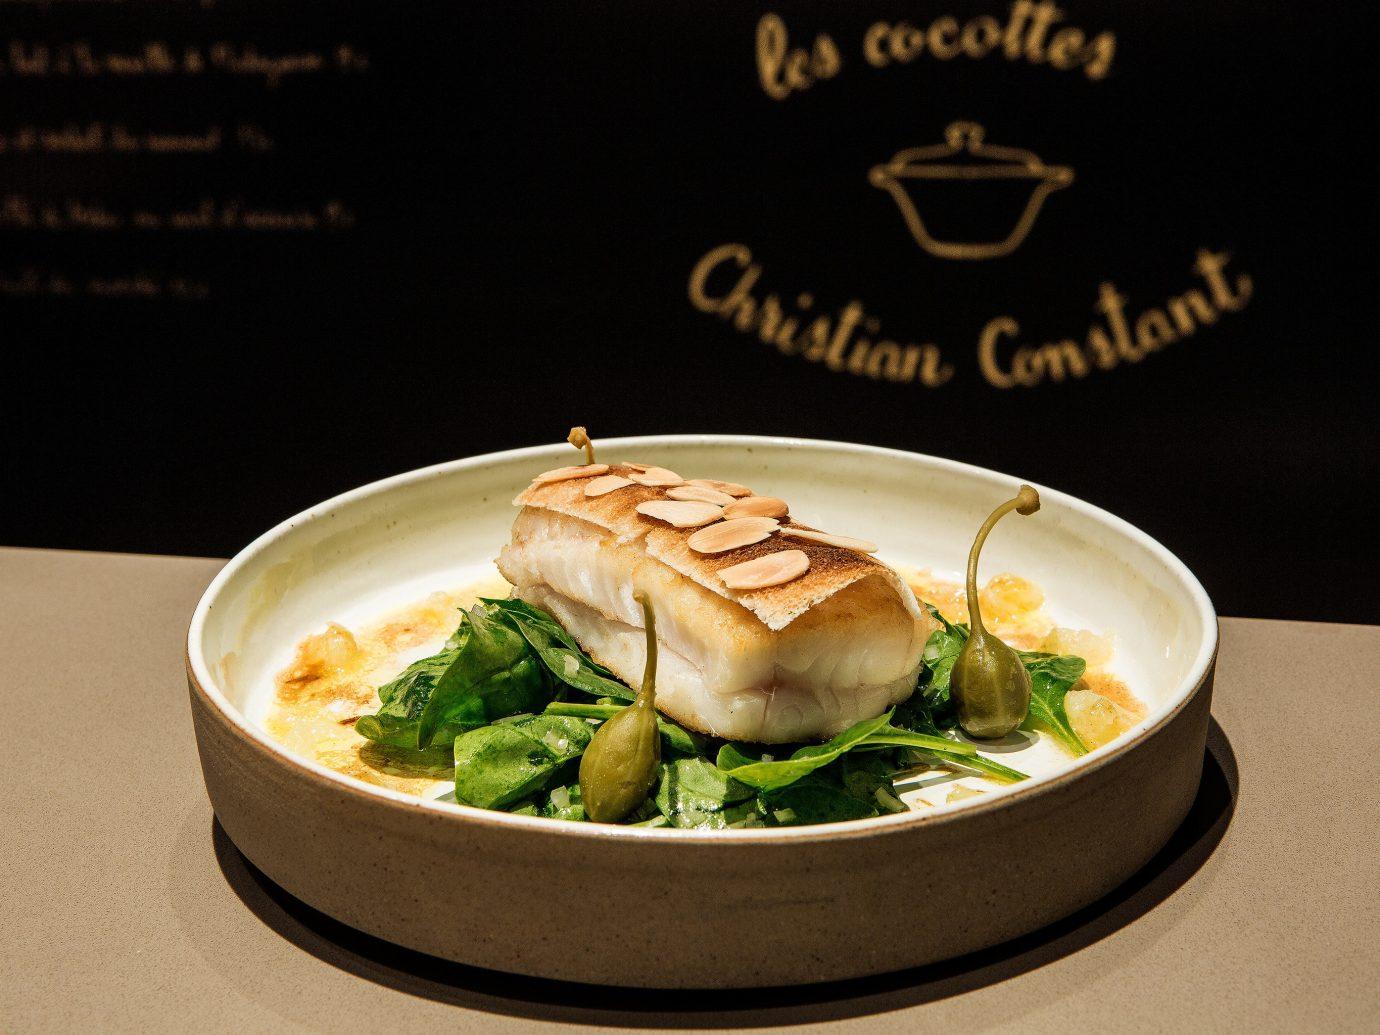 France Paris Trip Ideas table food dish plate meal cuisine restaurant sense produce asian food lunch